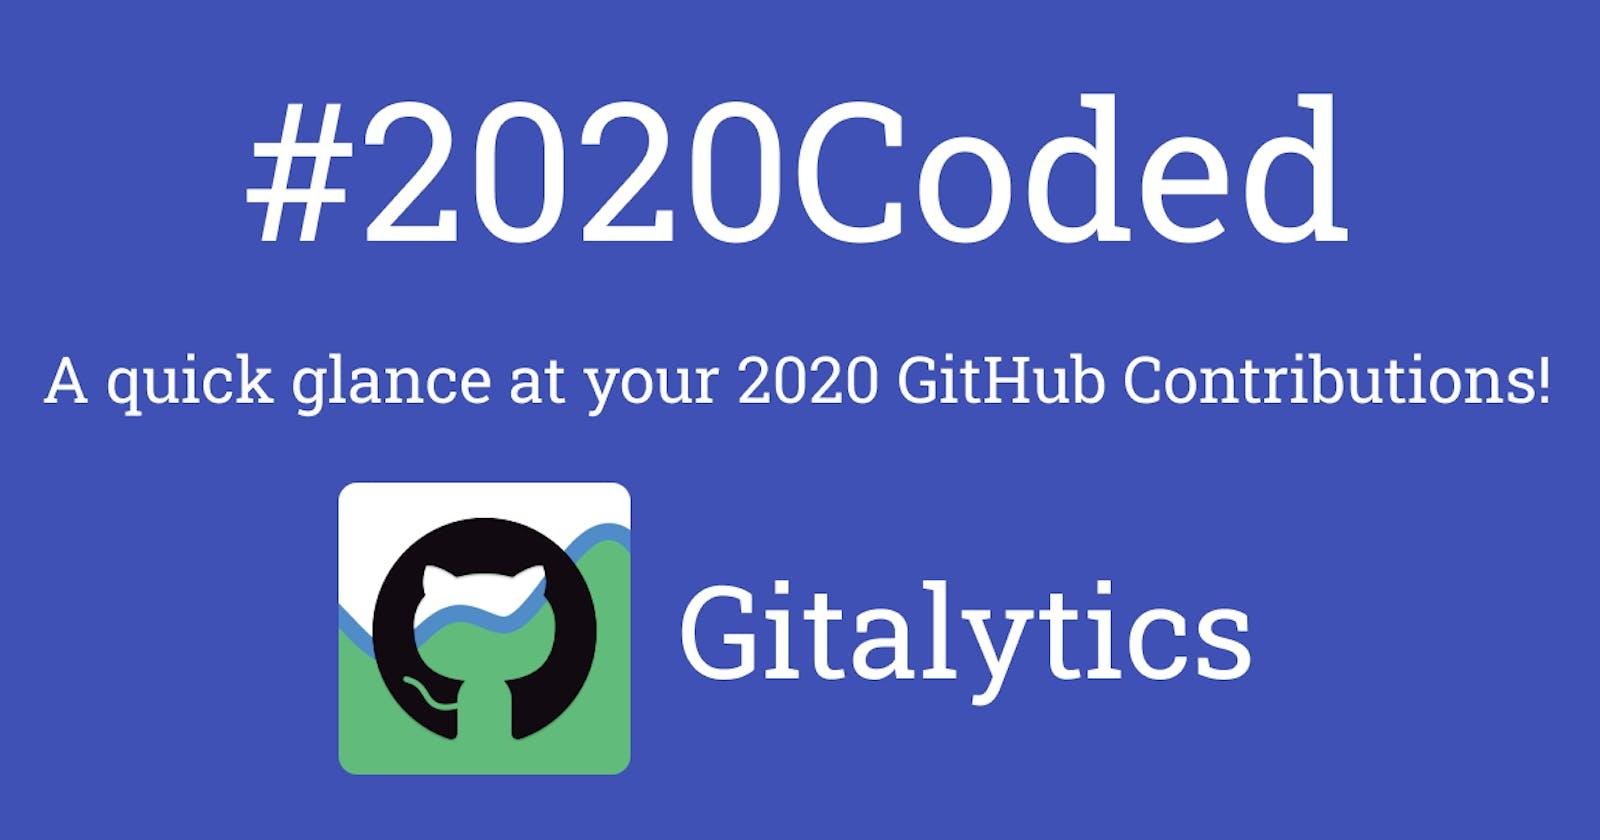 I created Gitalytics - A simple overview of Github activities